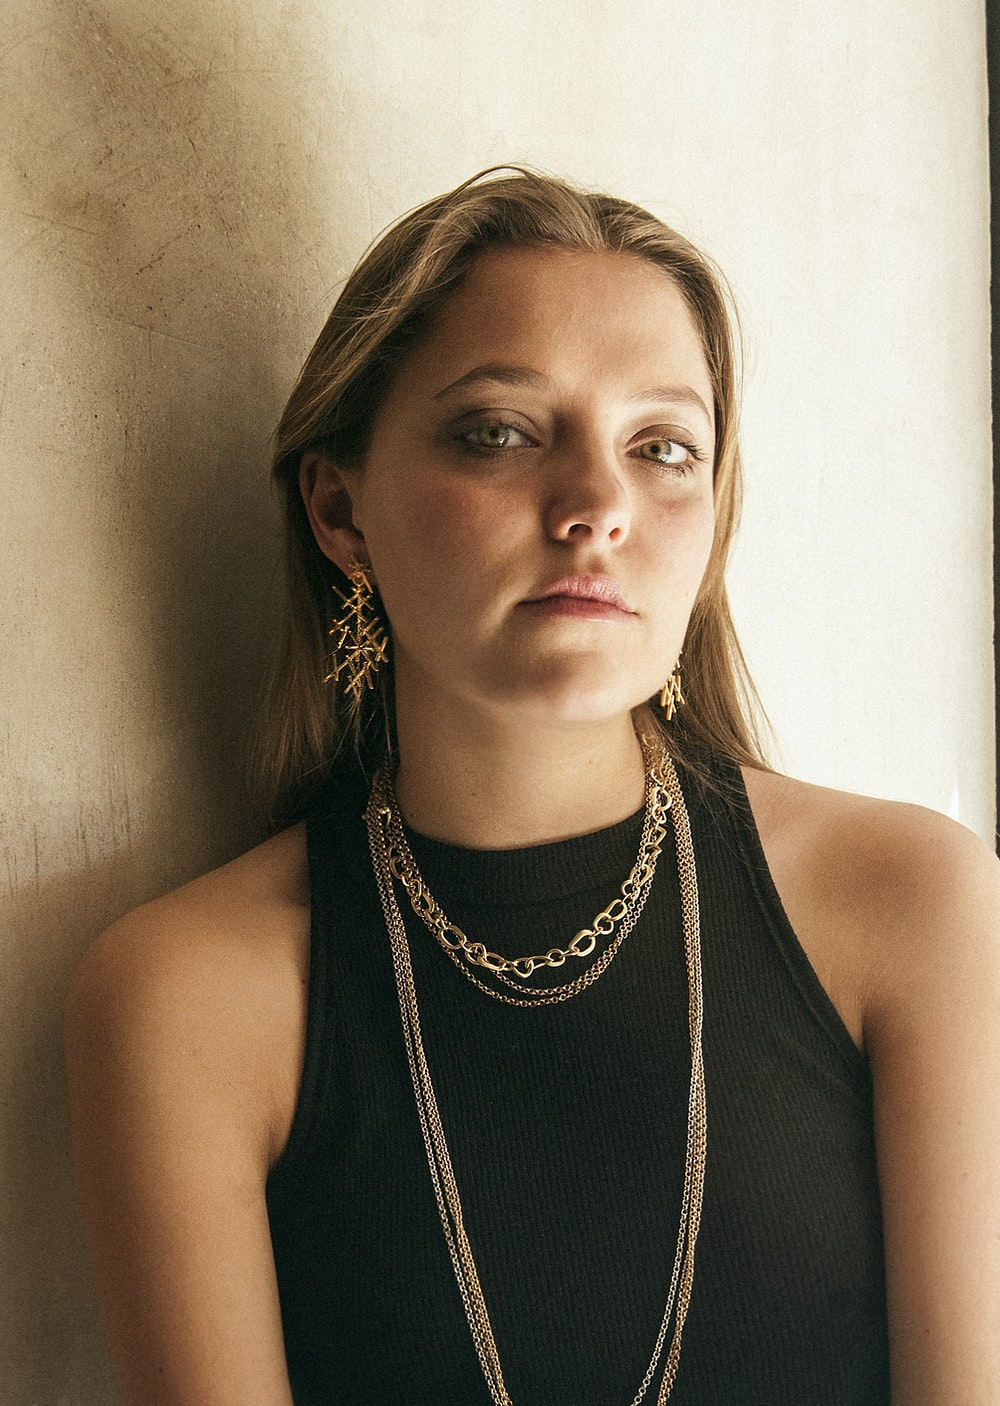 woman in black tank top wearing silver necklace